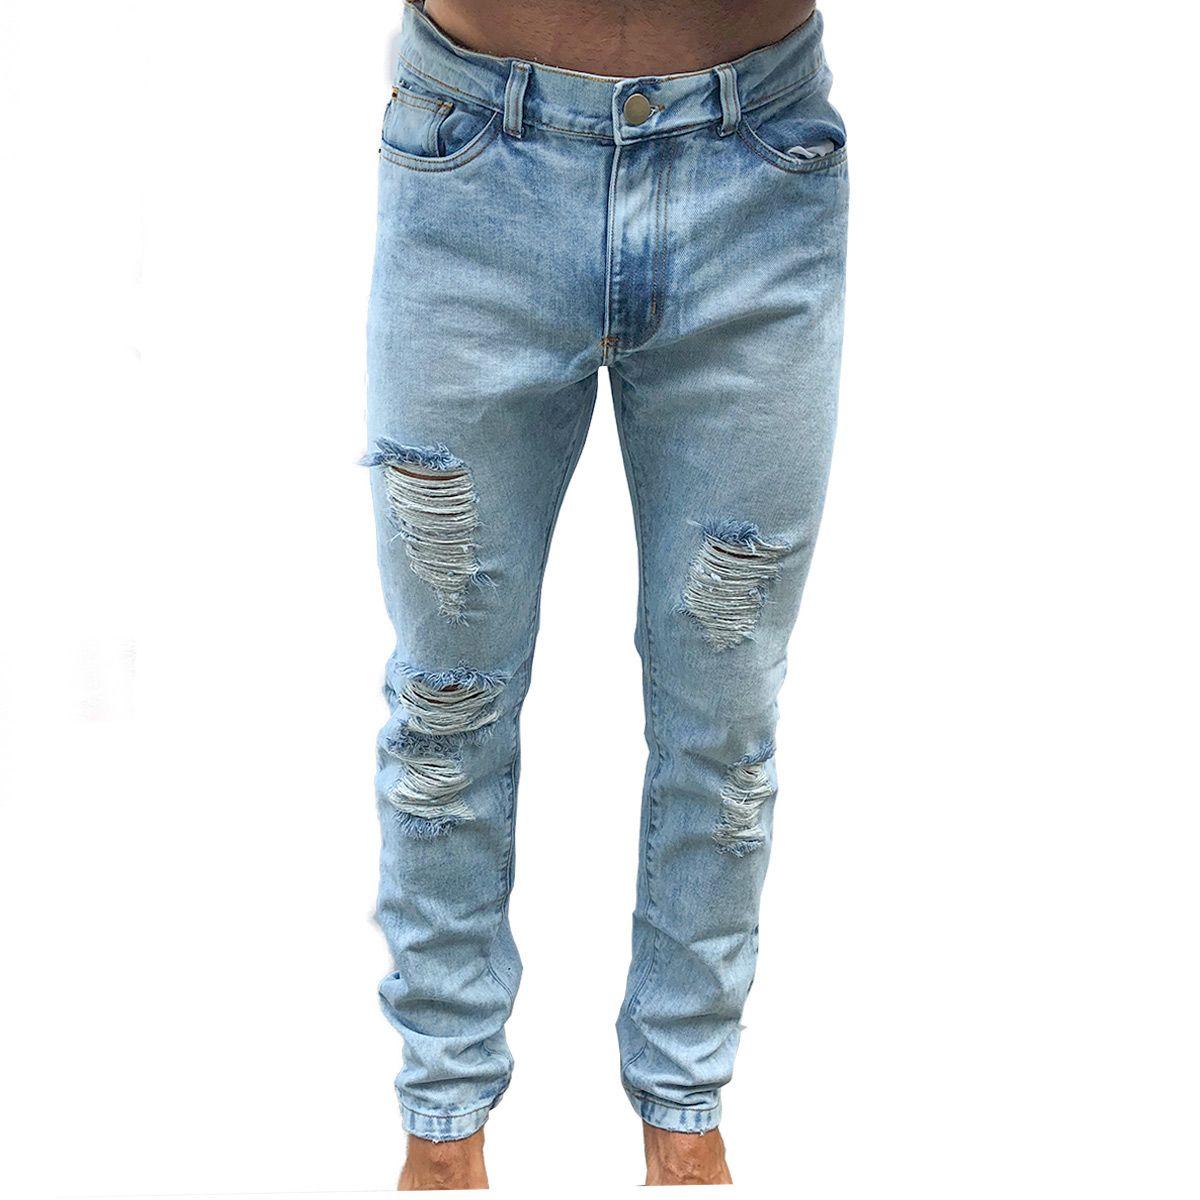 aca552b638 Calça Jeans Skyfoan Destroyed - VK by VK